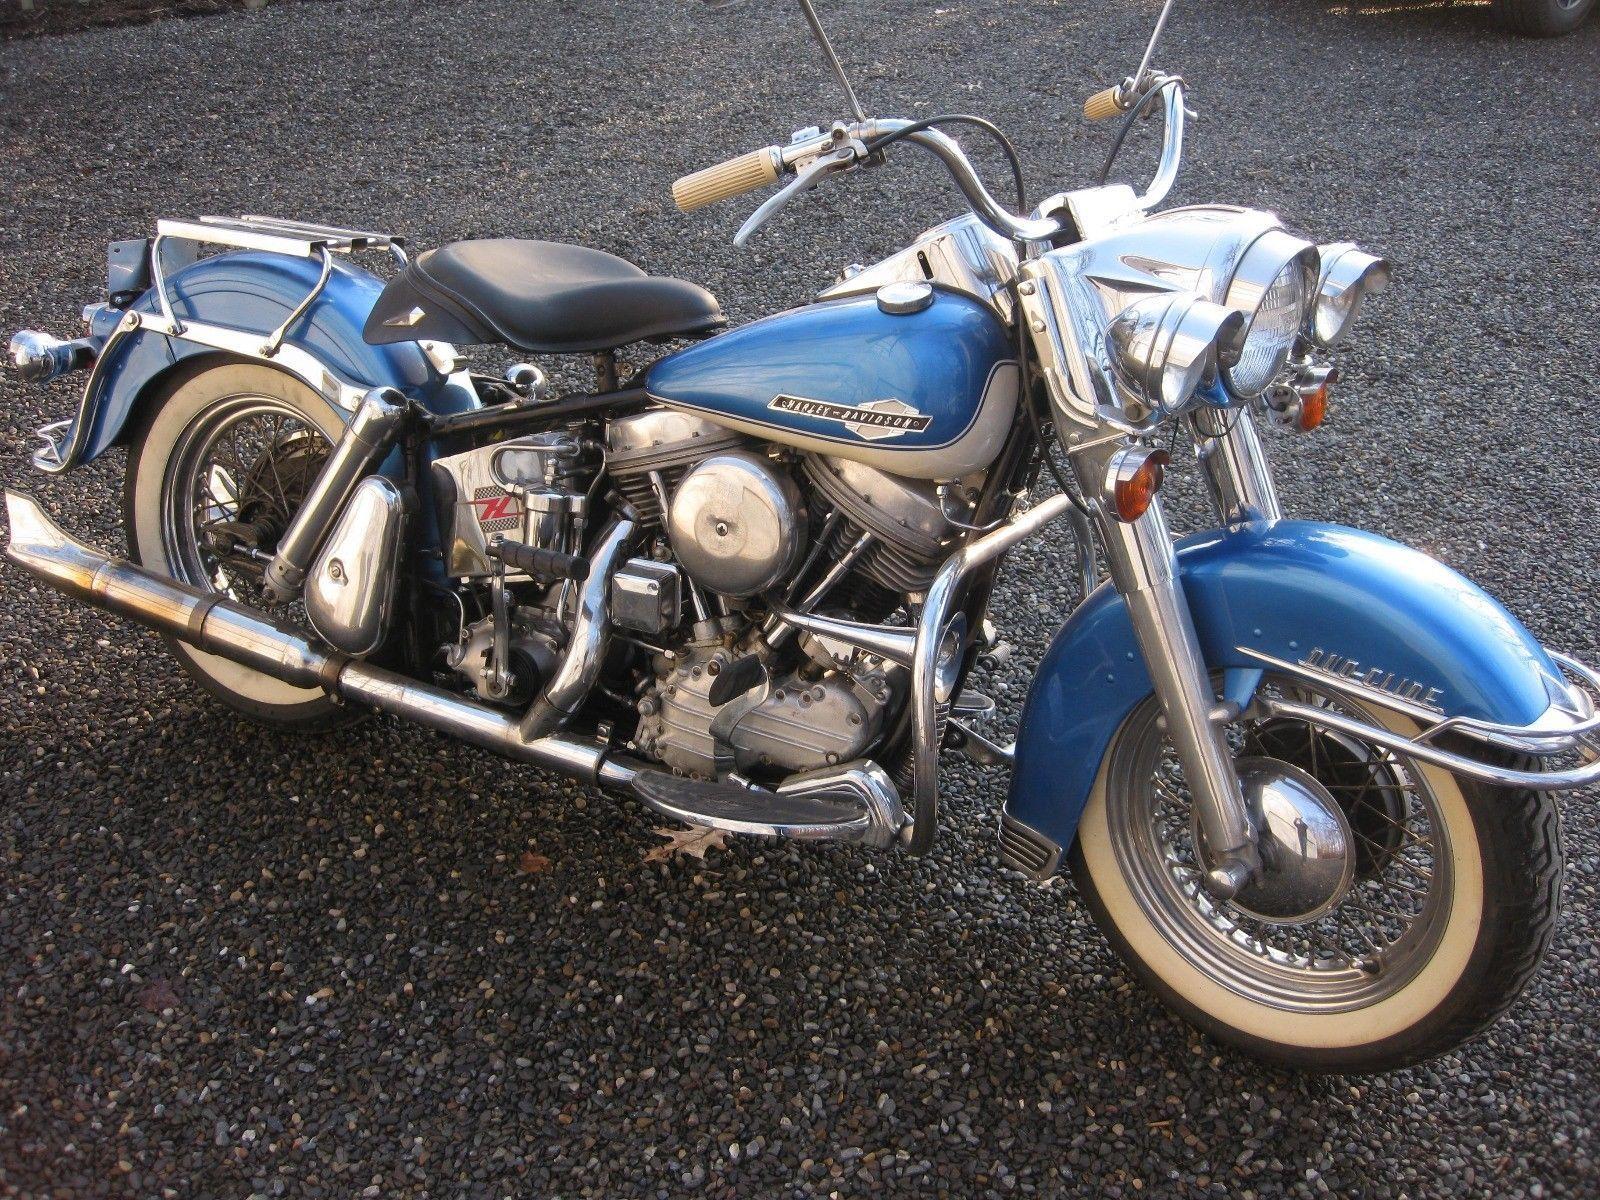 1963 Harley-Davidson Other | eBay | old school motorcycles